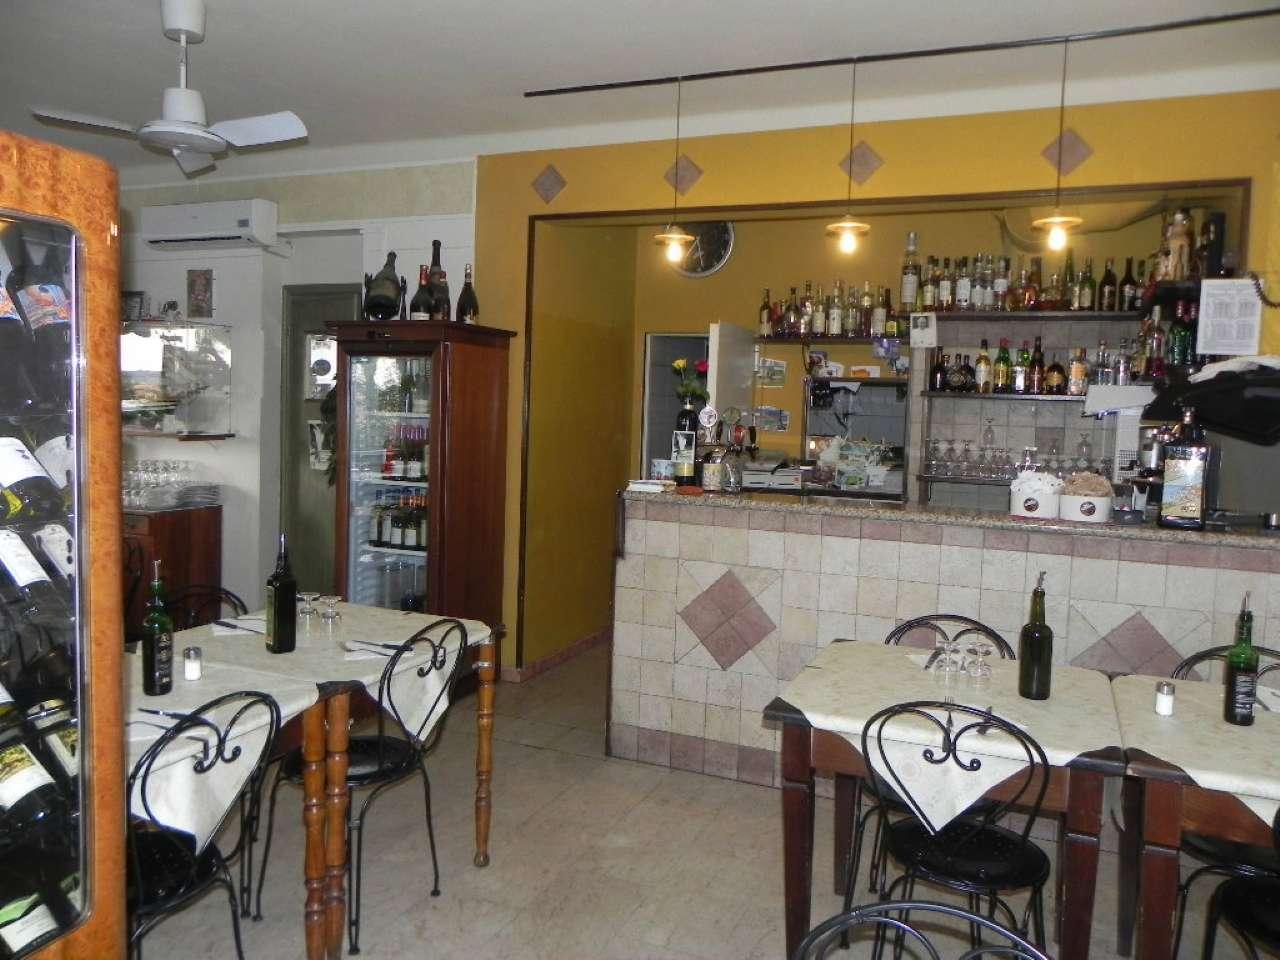 Ristorante / Pizzeria / Trattoria in vendita a Imperia, 9999 locali, Trattative riservate | CambioCasa.it